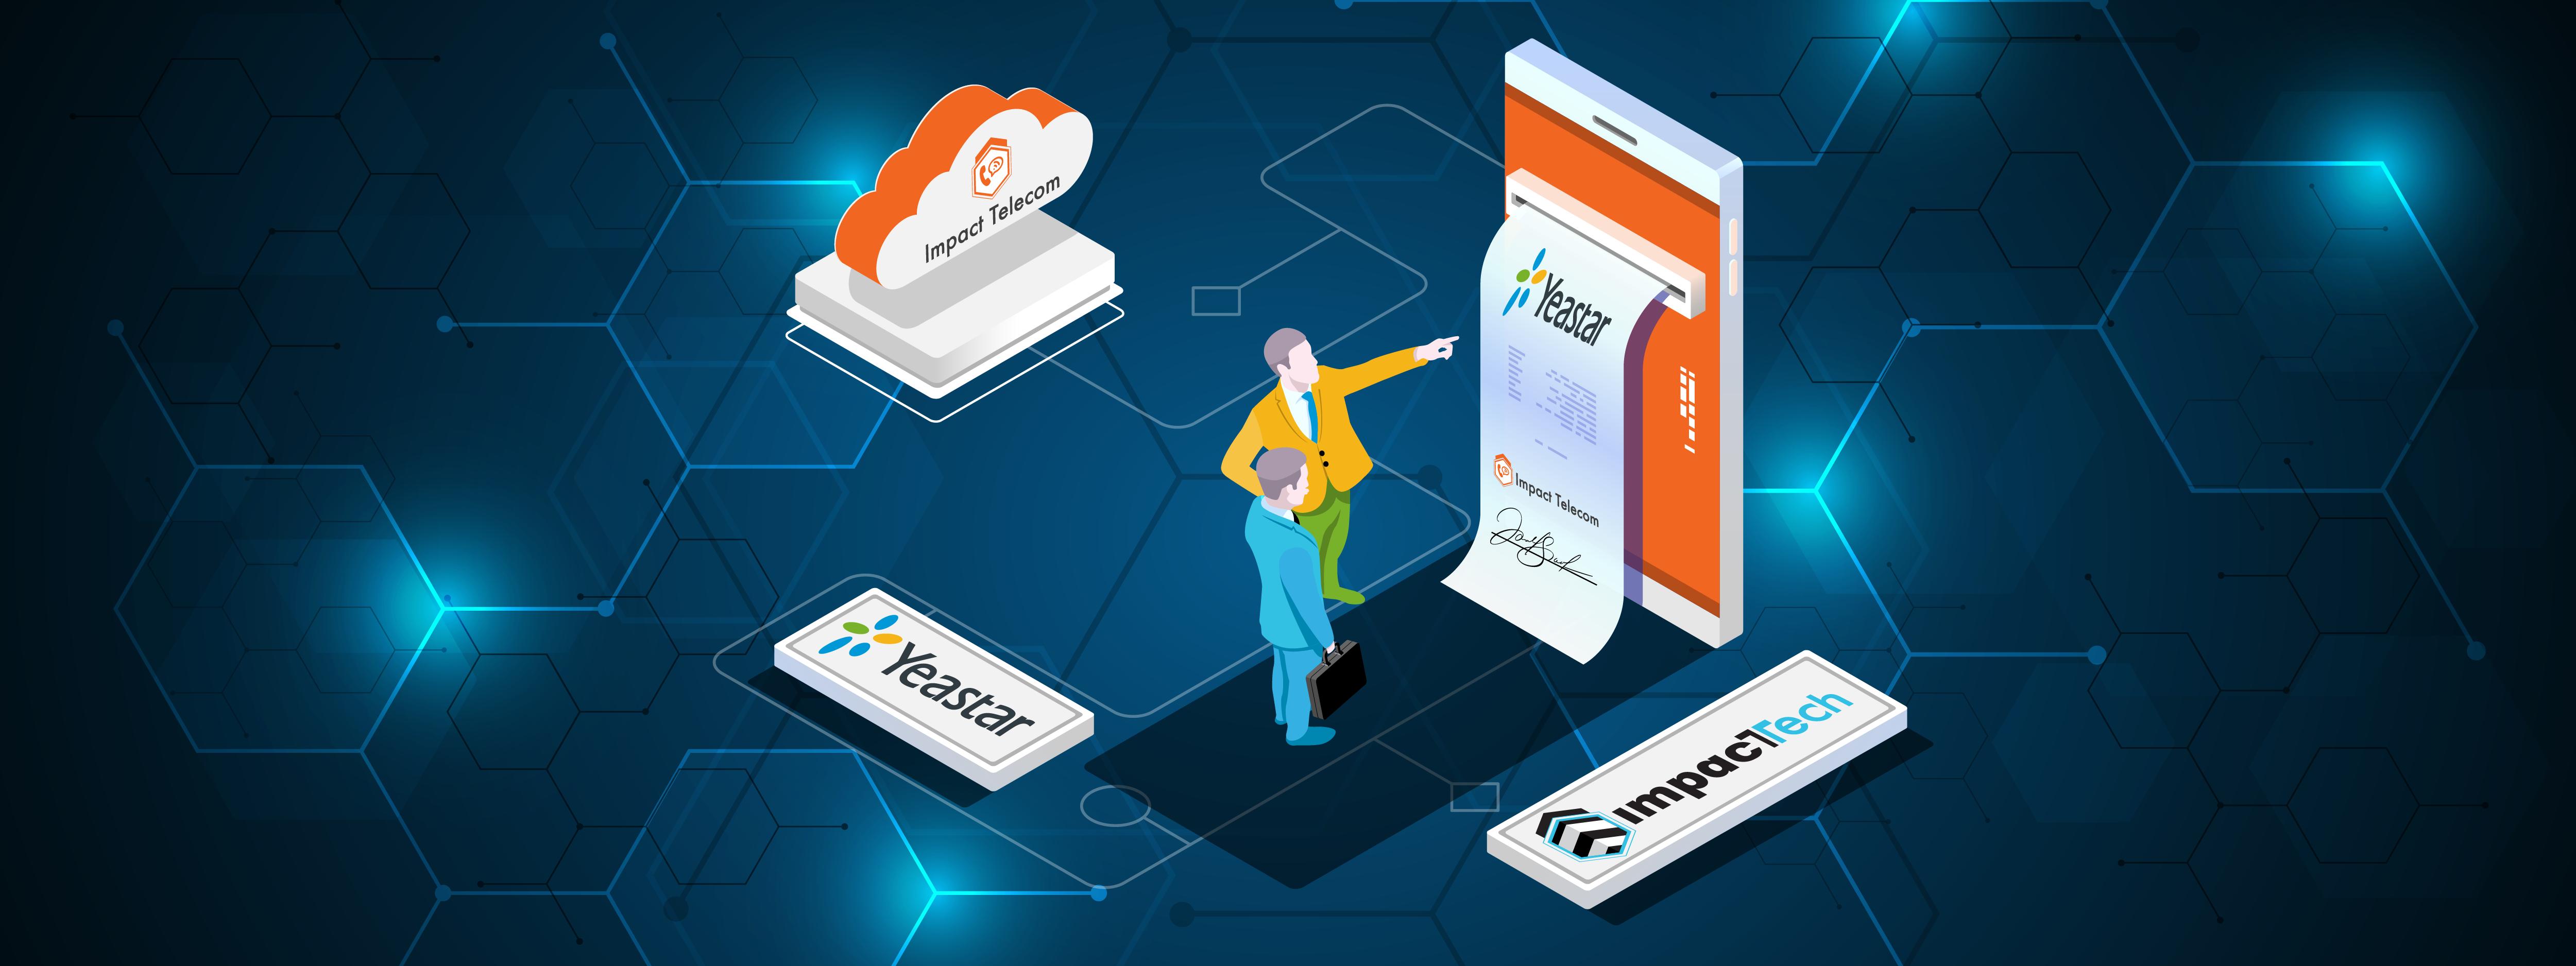 Yeastar Cloud PBX partnership